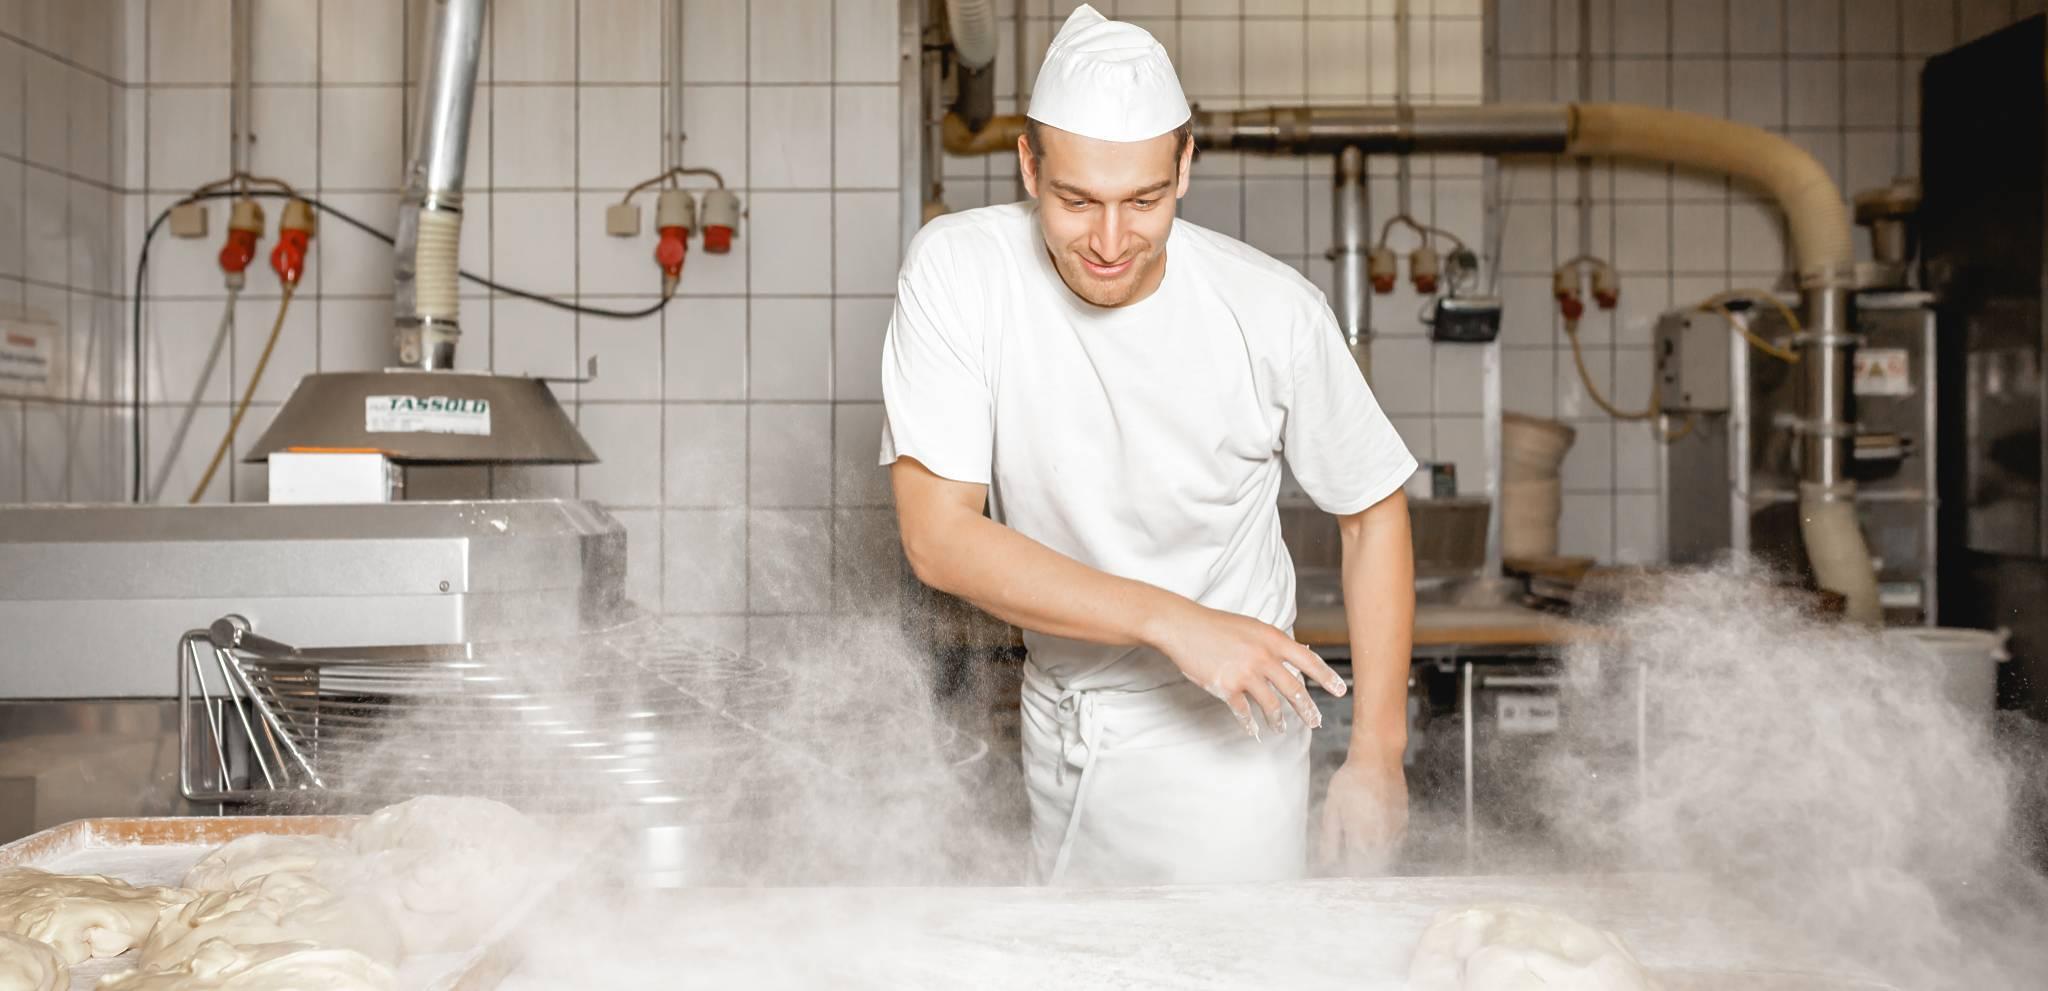 Backstube Bäckerei Konditorei Cafe Frühwirth Altmelon Lukas Frühwirth